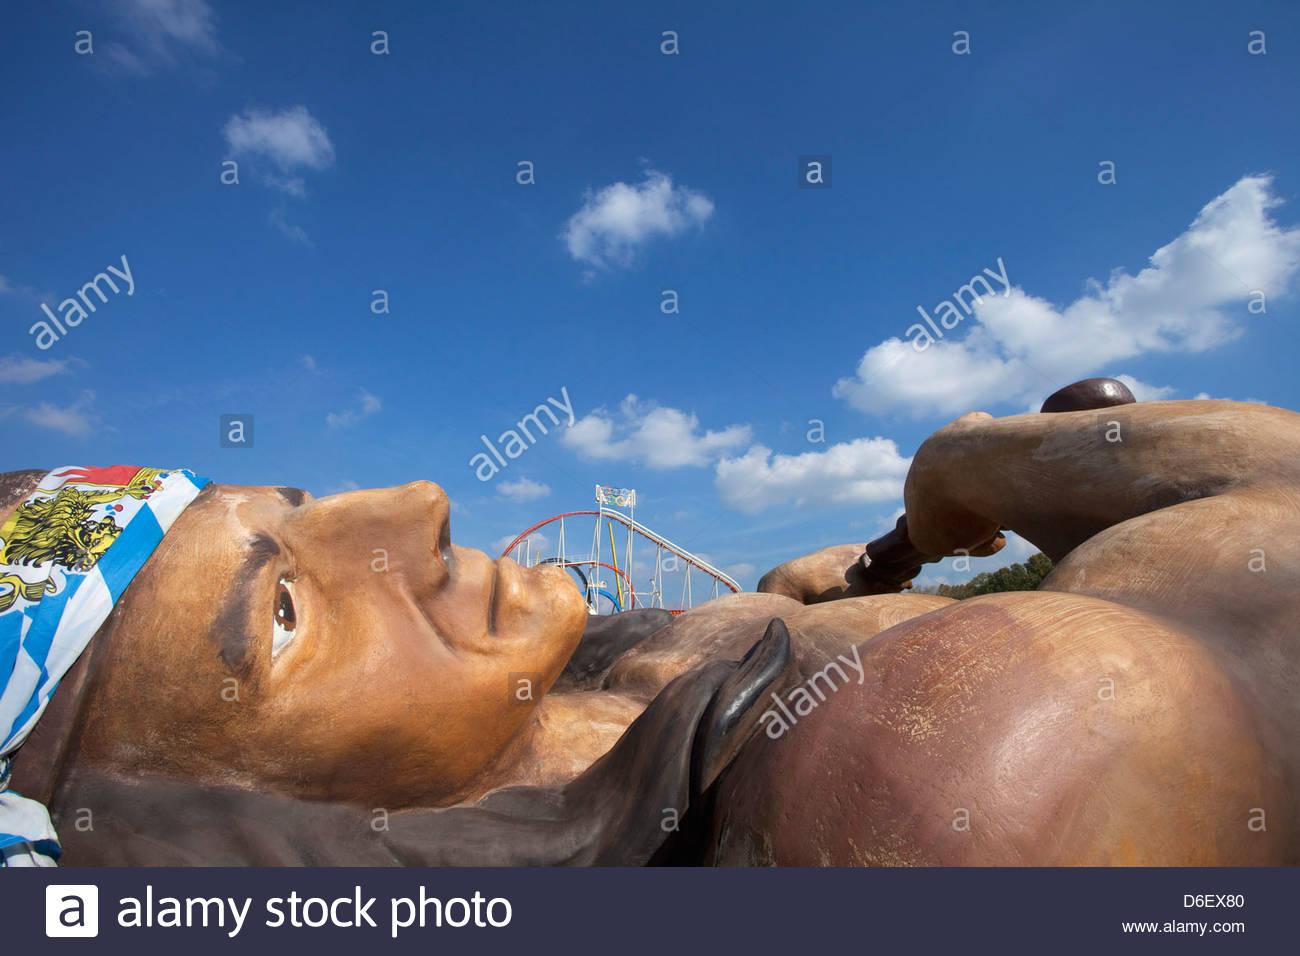 Giant American Indian figure Oktoberfest Munich Germany - Stock Image